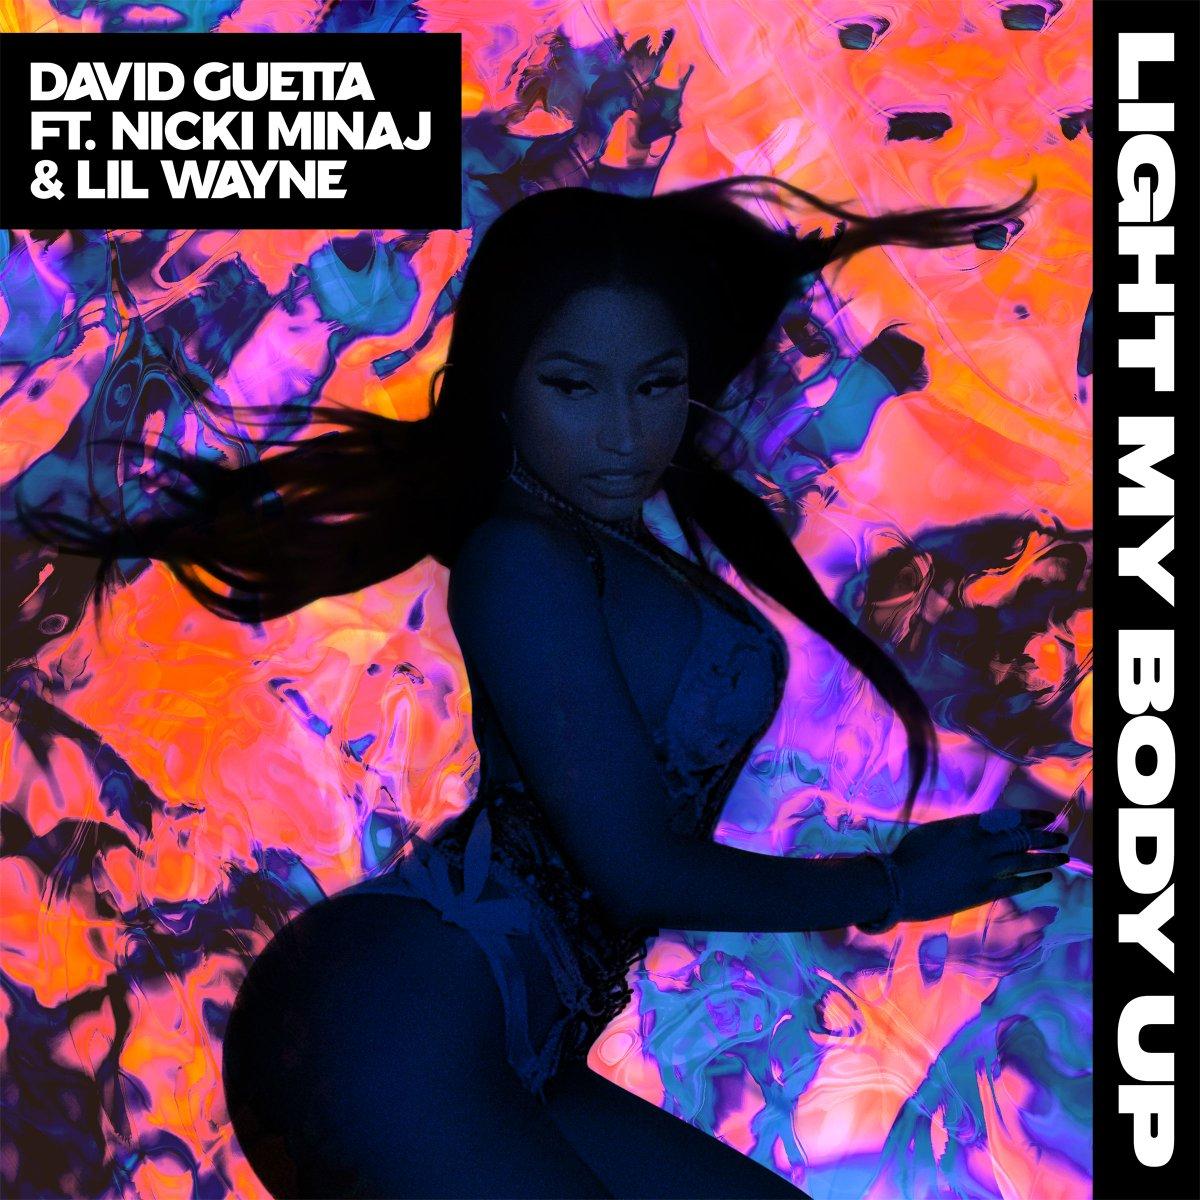 New banger! @DavidGuetta 'Light My Body Up' feat. @NickiMinaj + @LilTu...